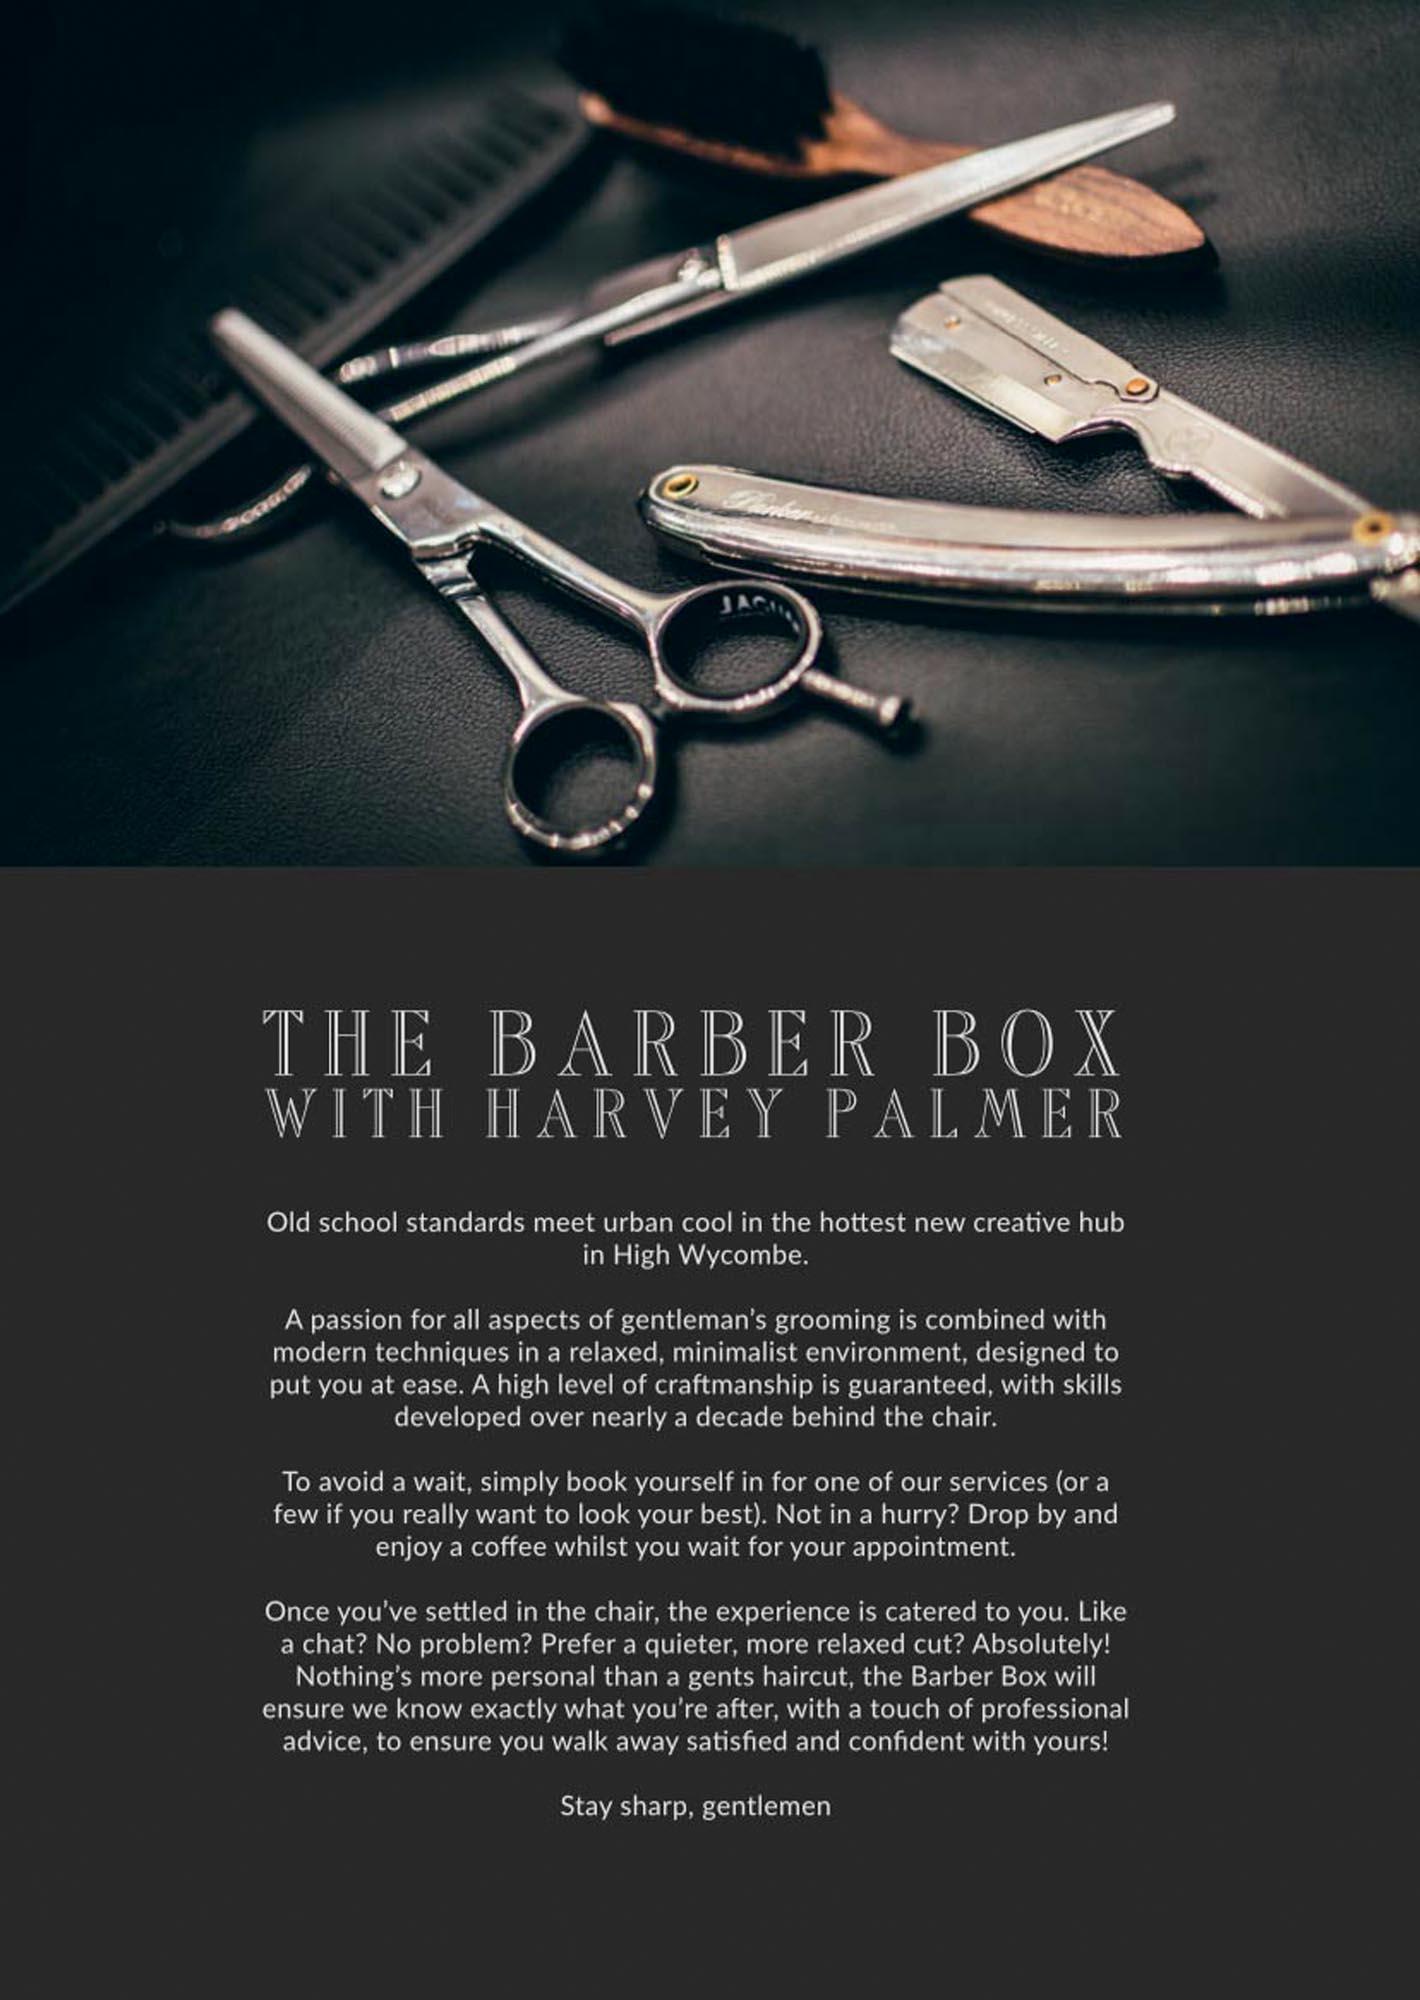 barberbox-logo-designer-london01